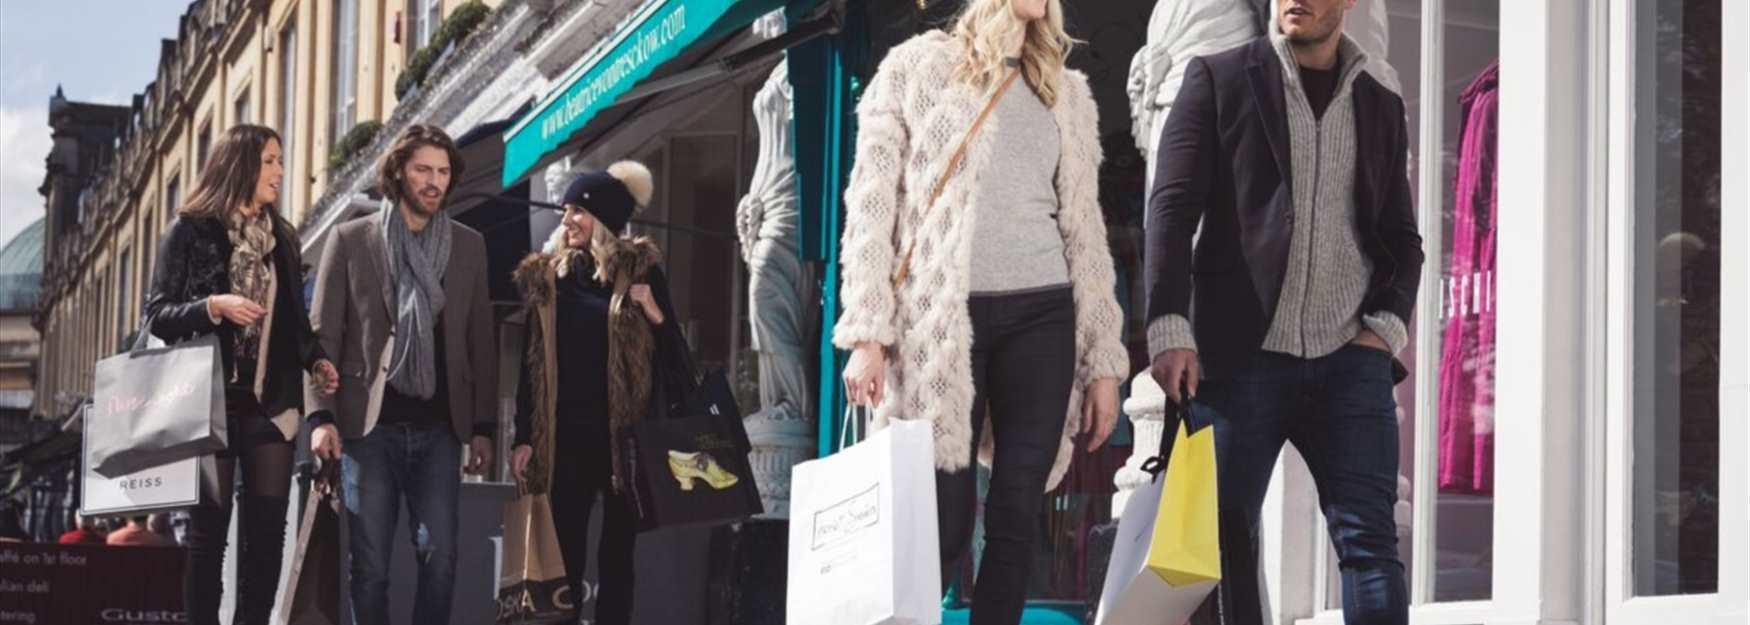 Shopping in Montpellier